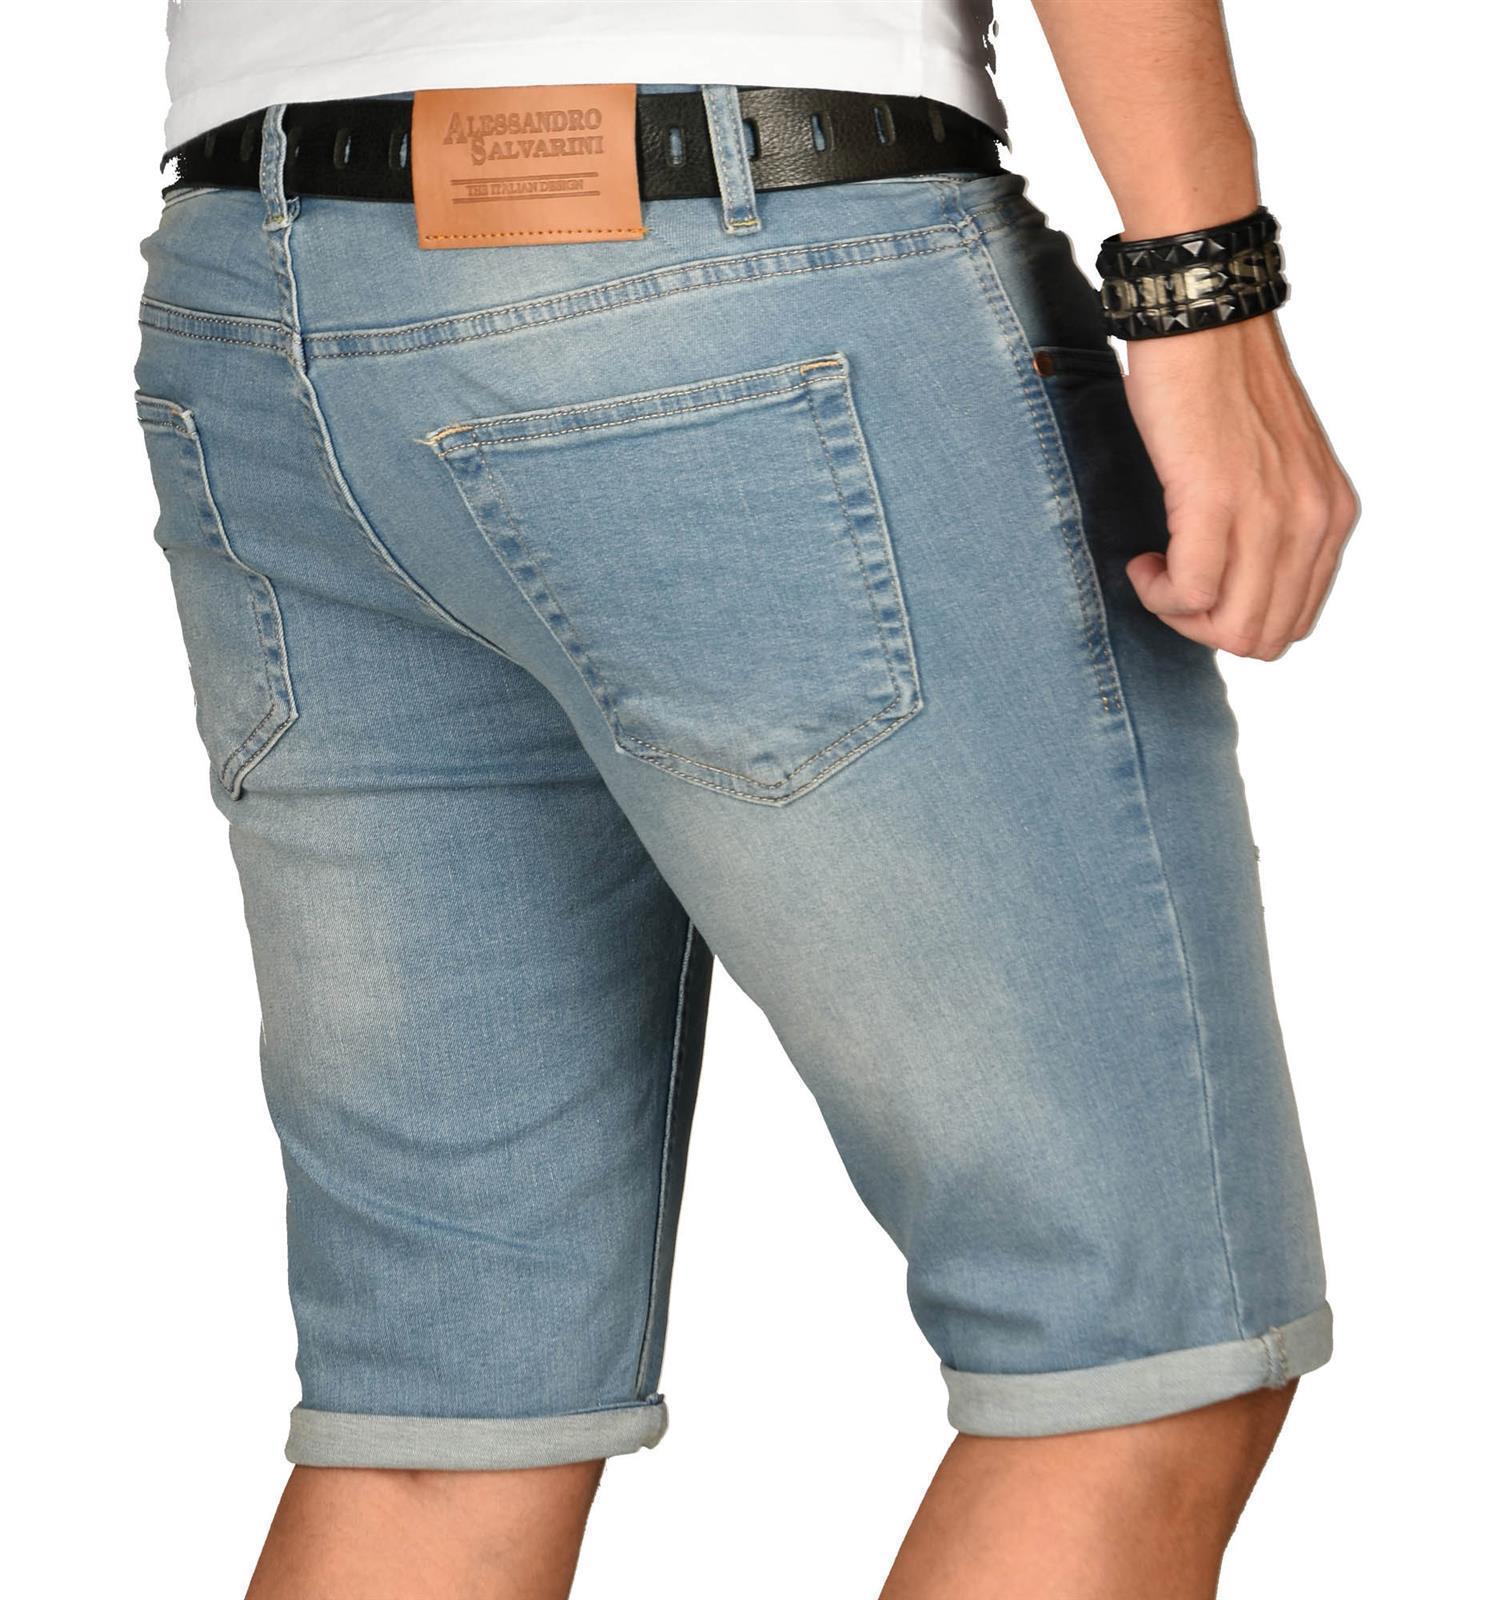 A-Salvarini-Herren-Designer-Jeans-Short-kurze-Hose-Slim-Sommer-Shorts-Washed Indexbild 24